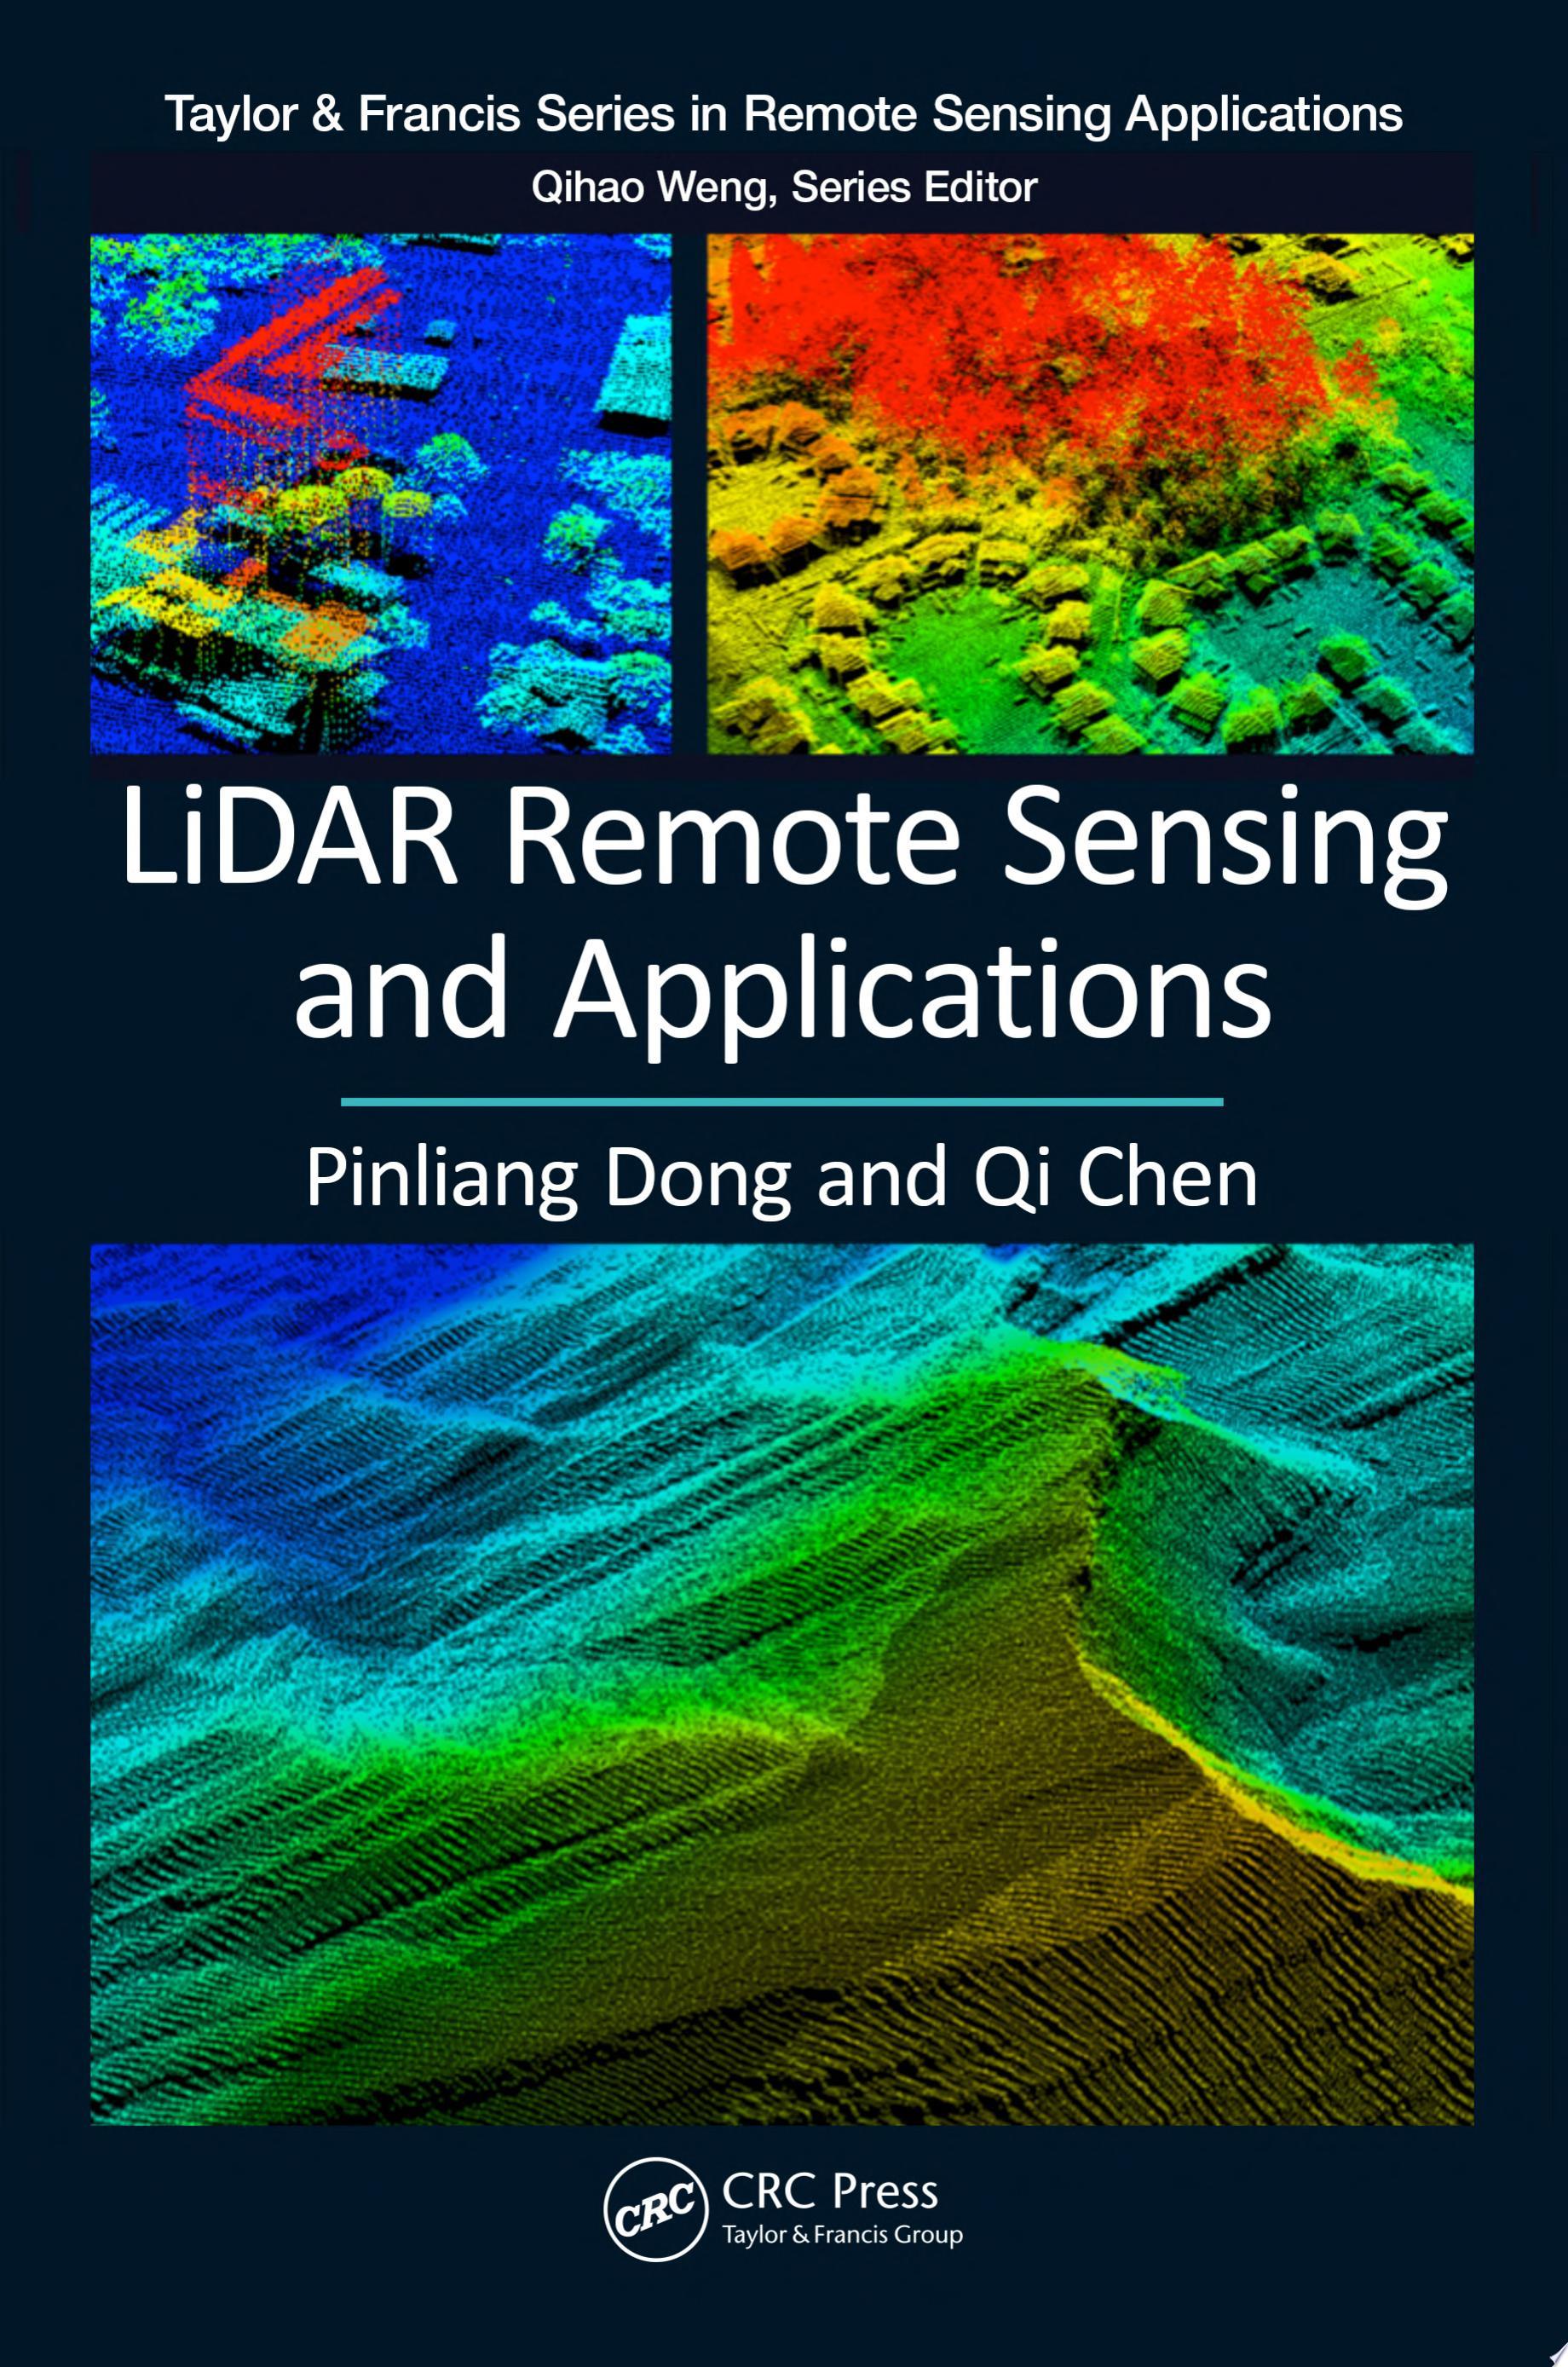 LiDAR Remote Sensing and Applications